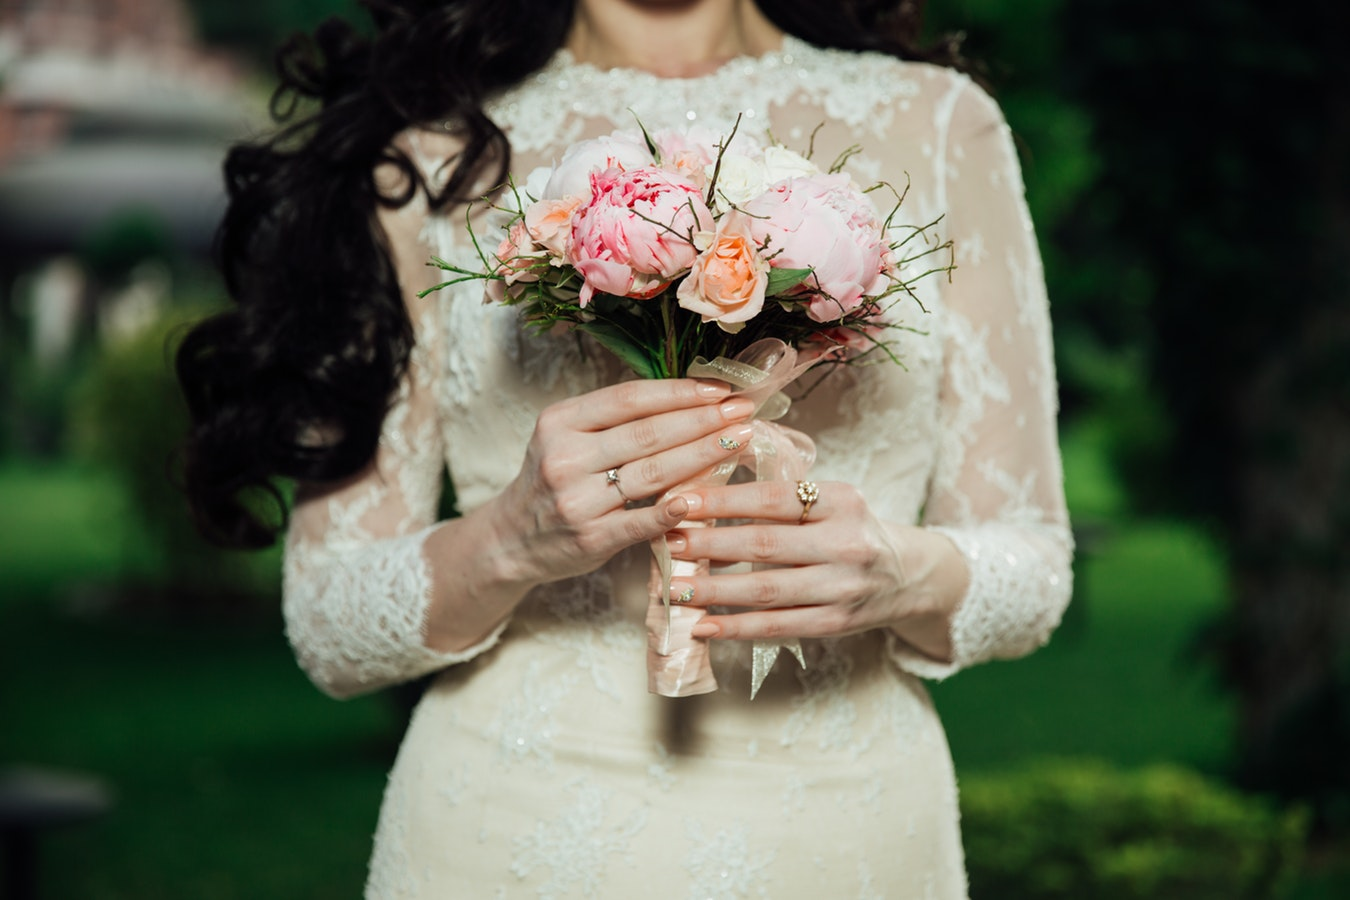 Favoloso Le poesie dedicate al matrimonio di Nazim Hikmet Ran | Pourfemme FG49